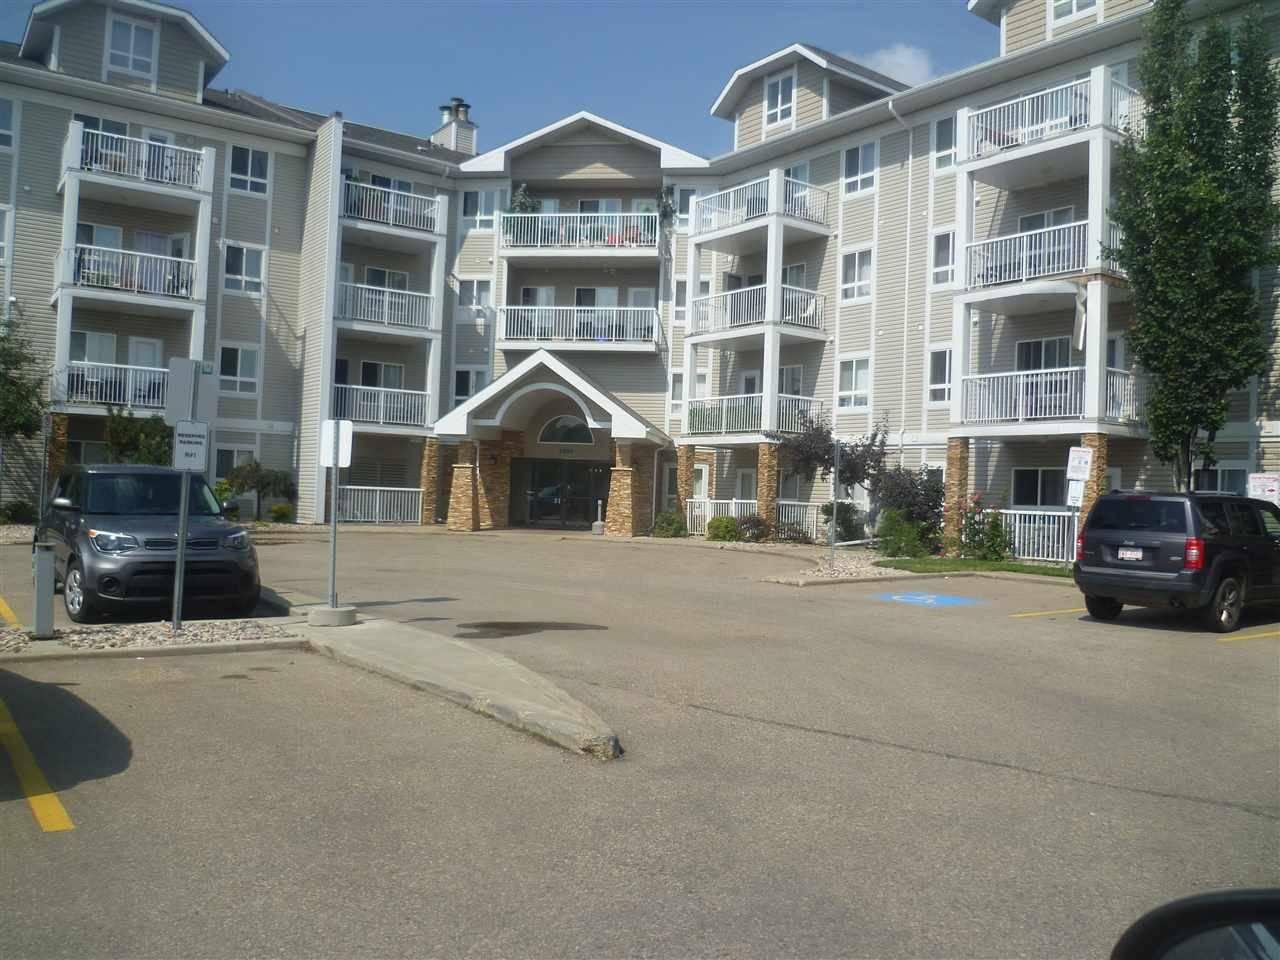 416 - 5350 199 Street Nw, Edmonton | Image 1